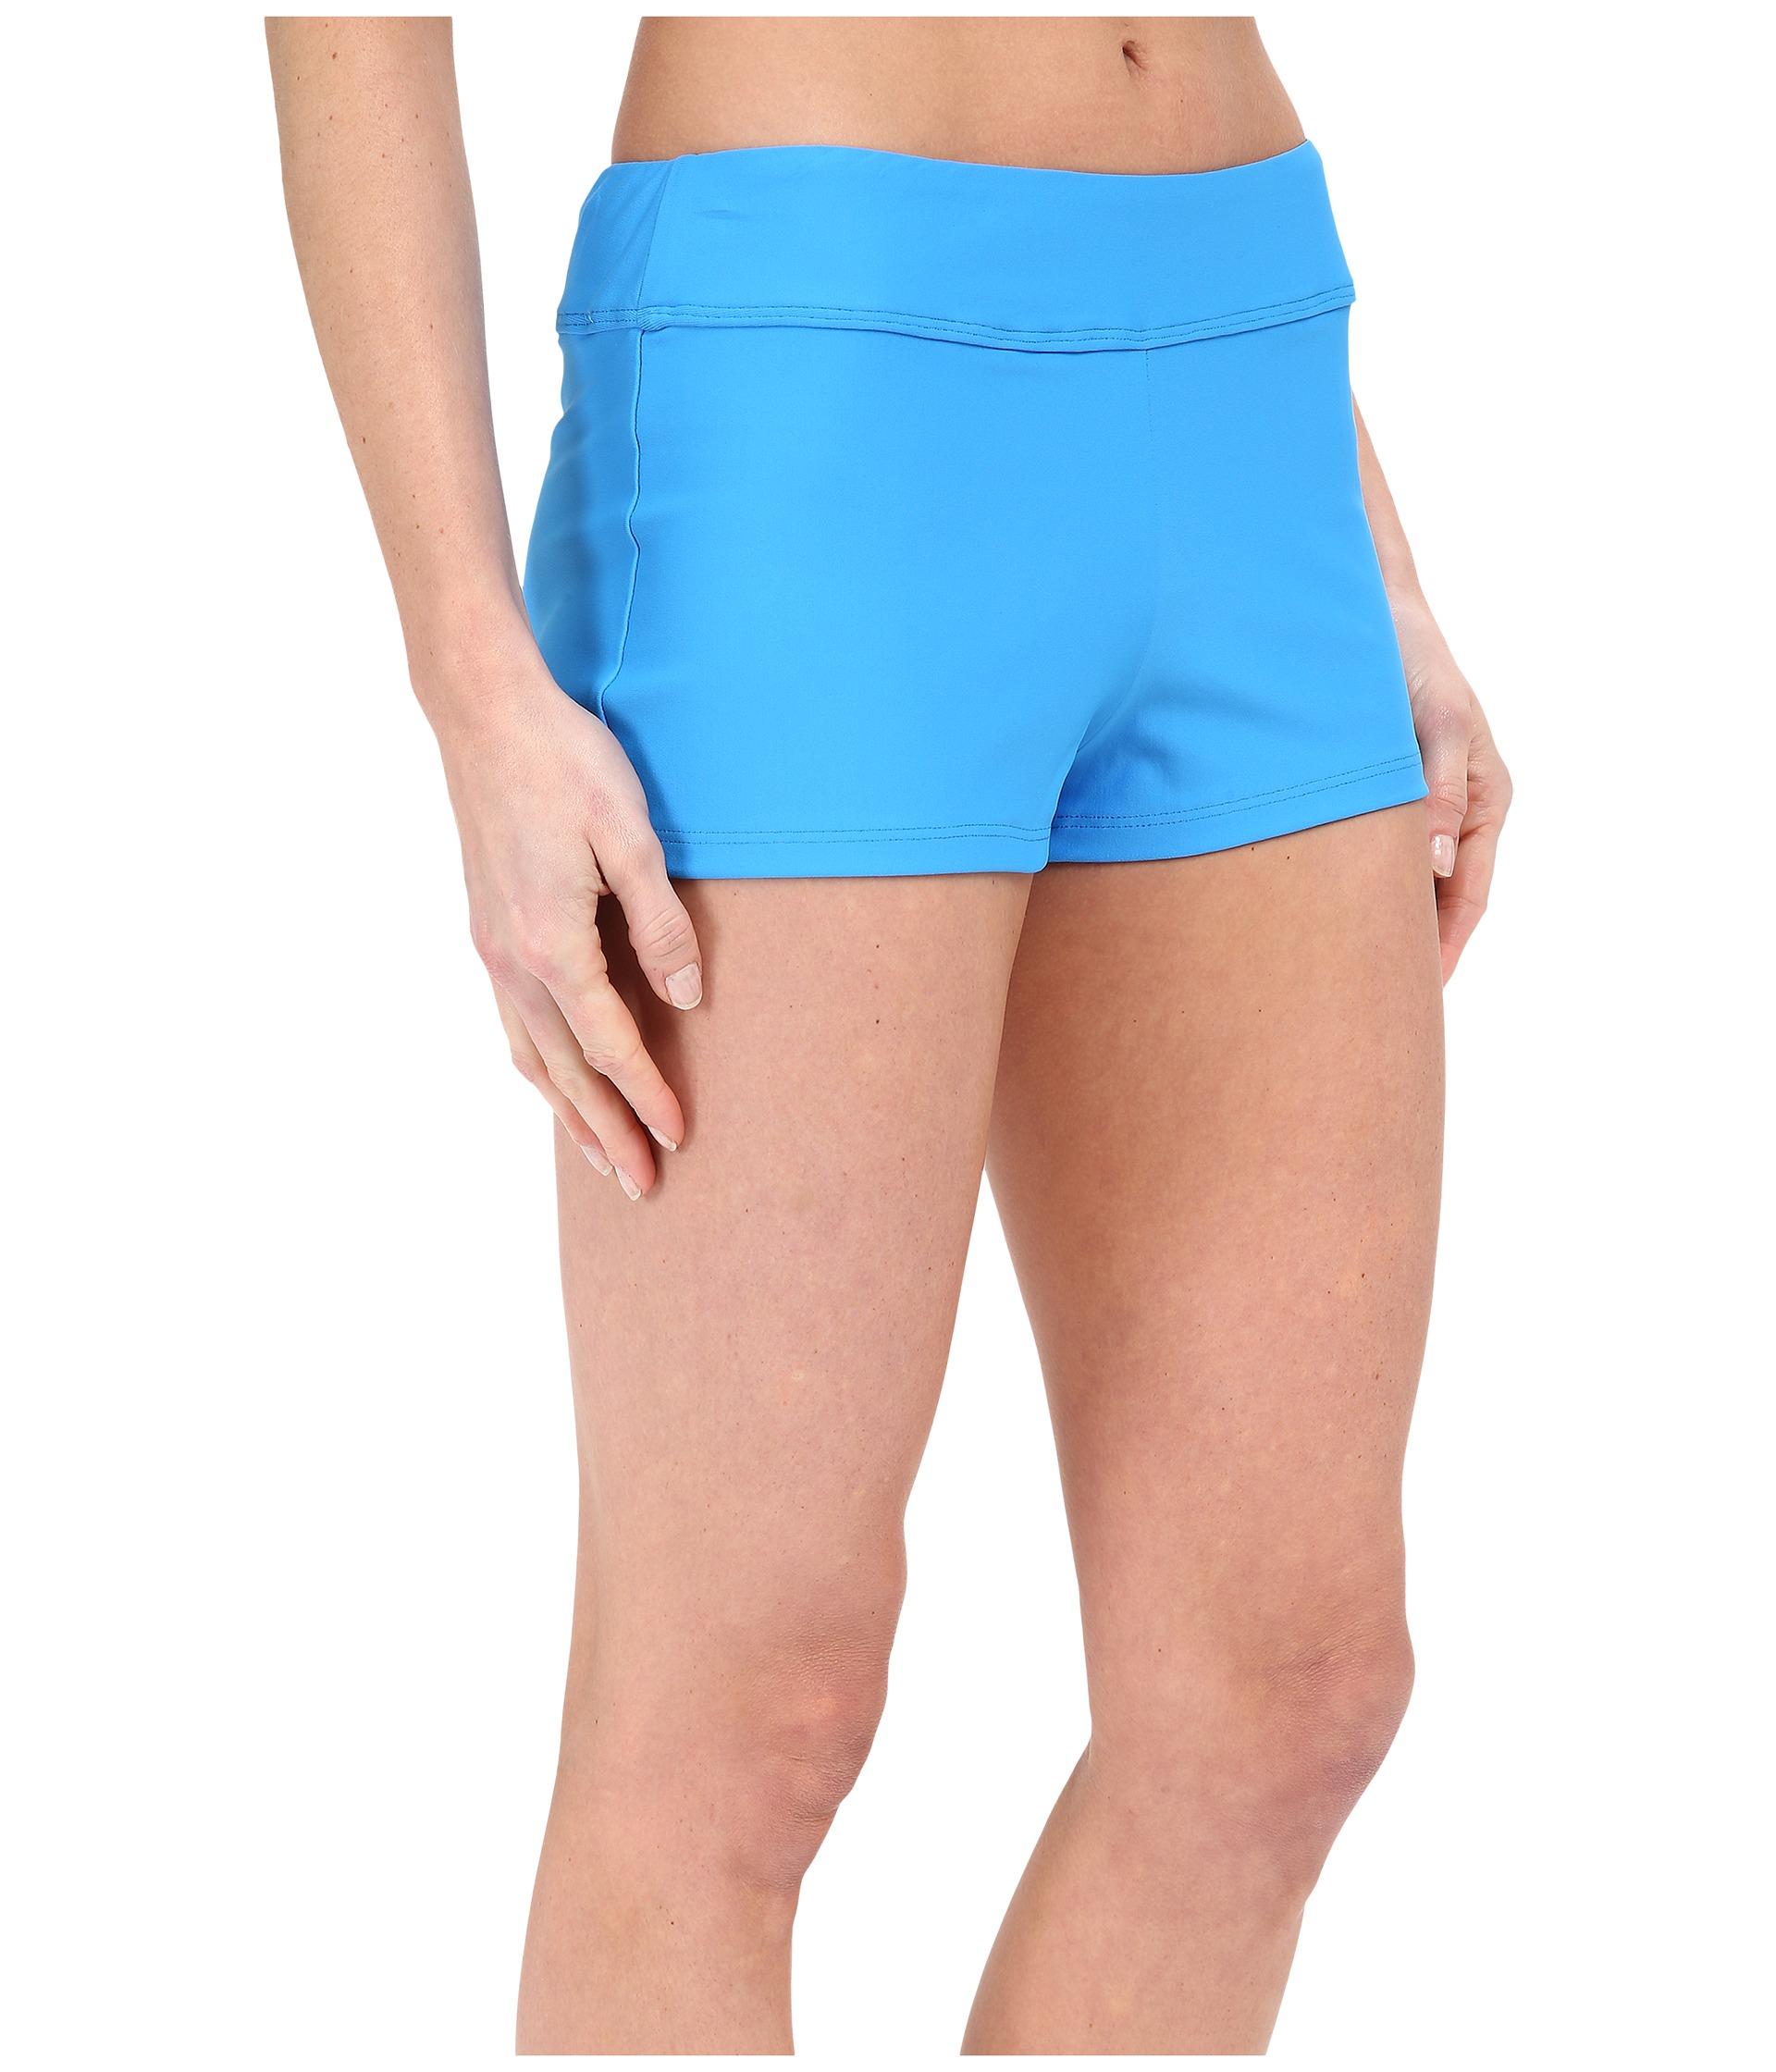 471b3d2d6e Next By Athena Good Karma Jump Start Swim Shorts in Blue - Lyst